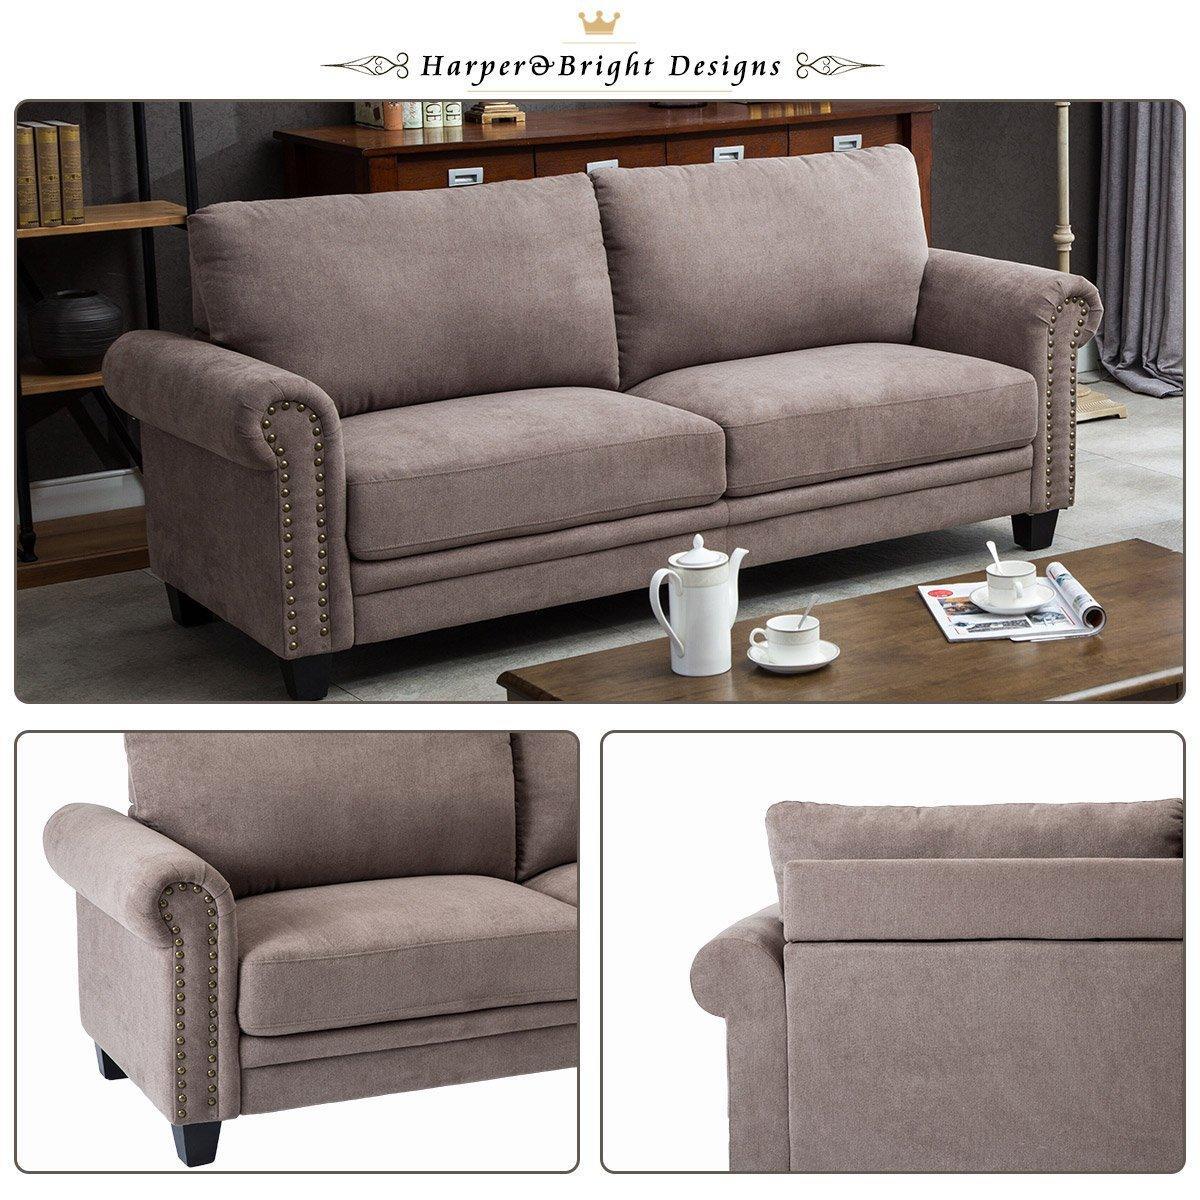 Living Room Set Amazon: Harper&Bright Designs Living Room Sofa Set Collection